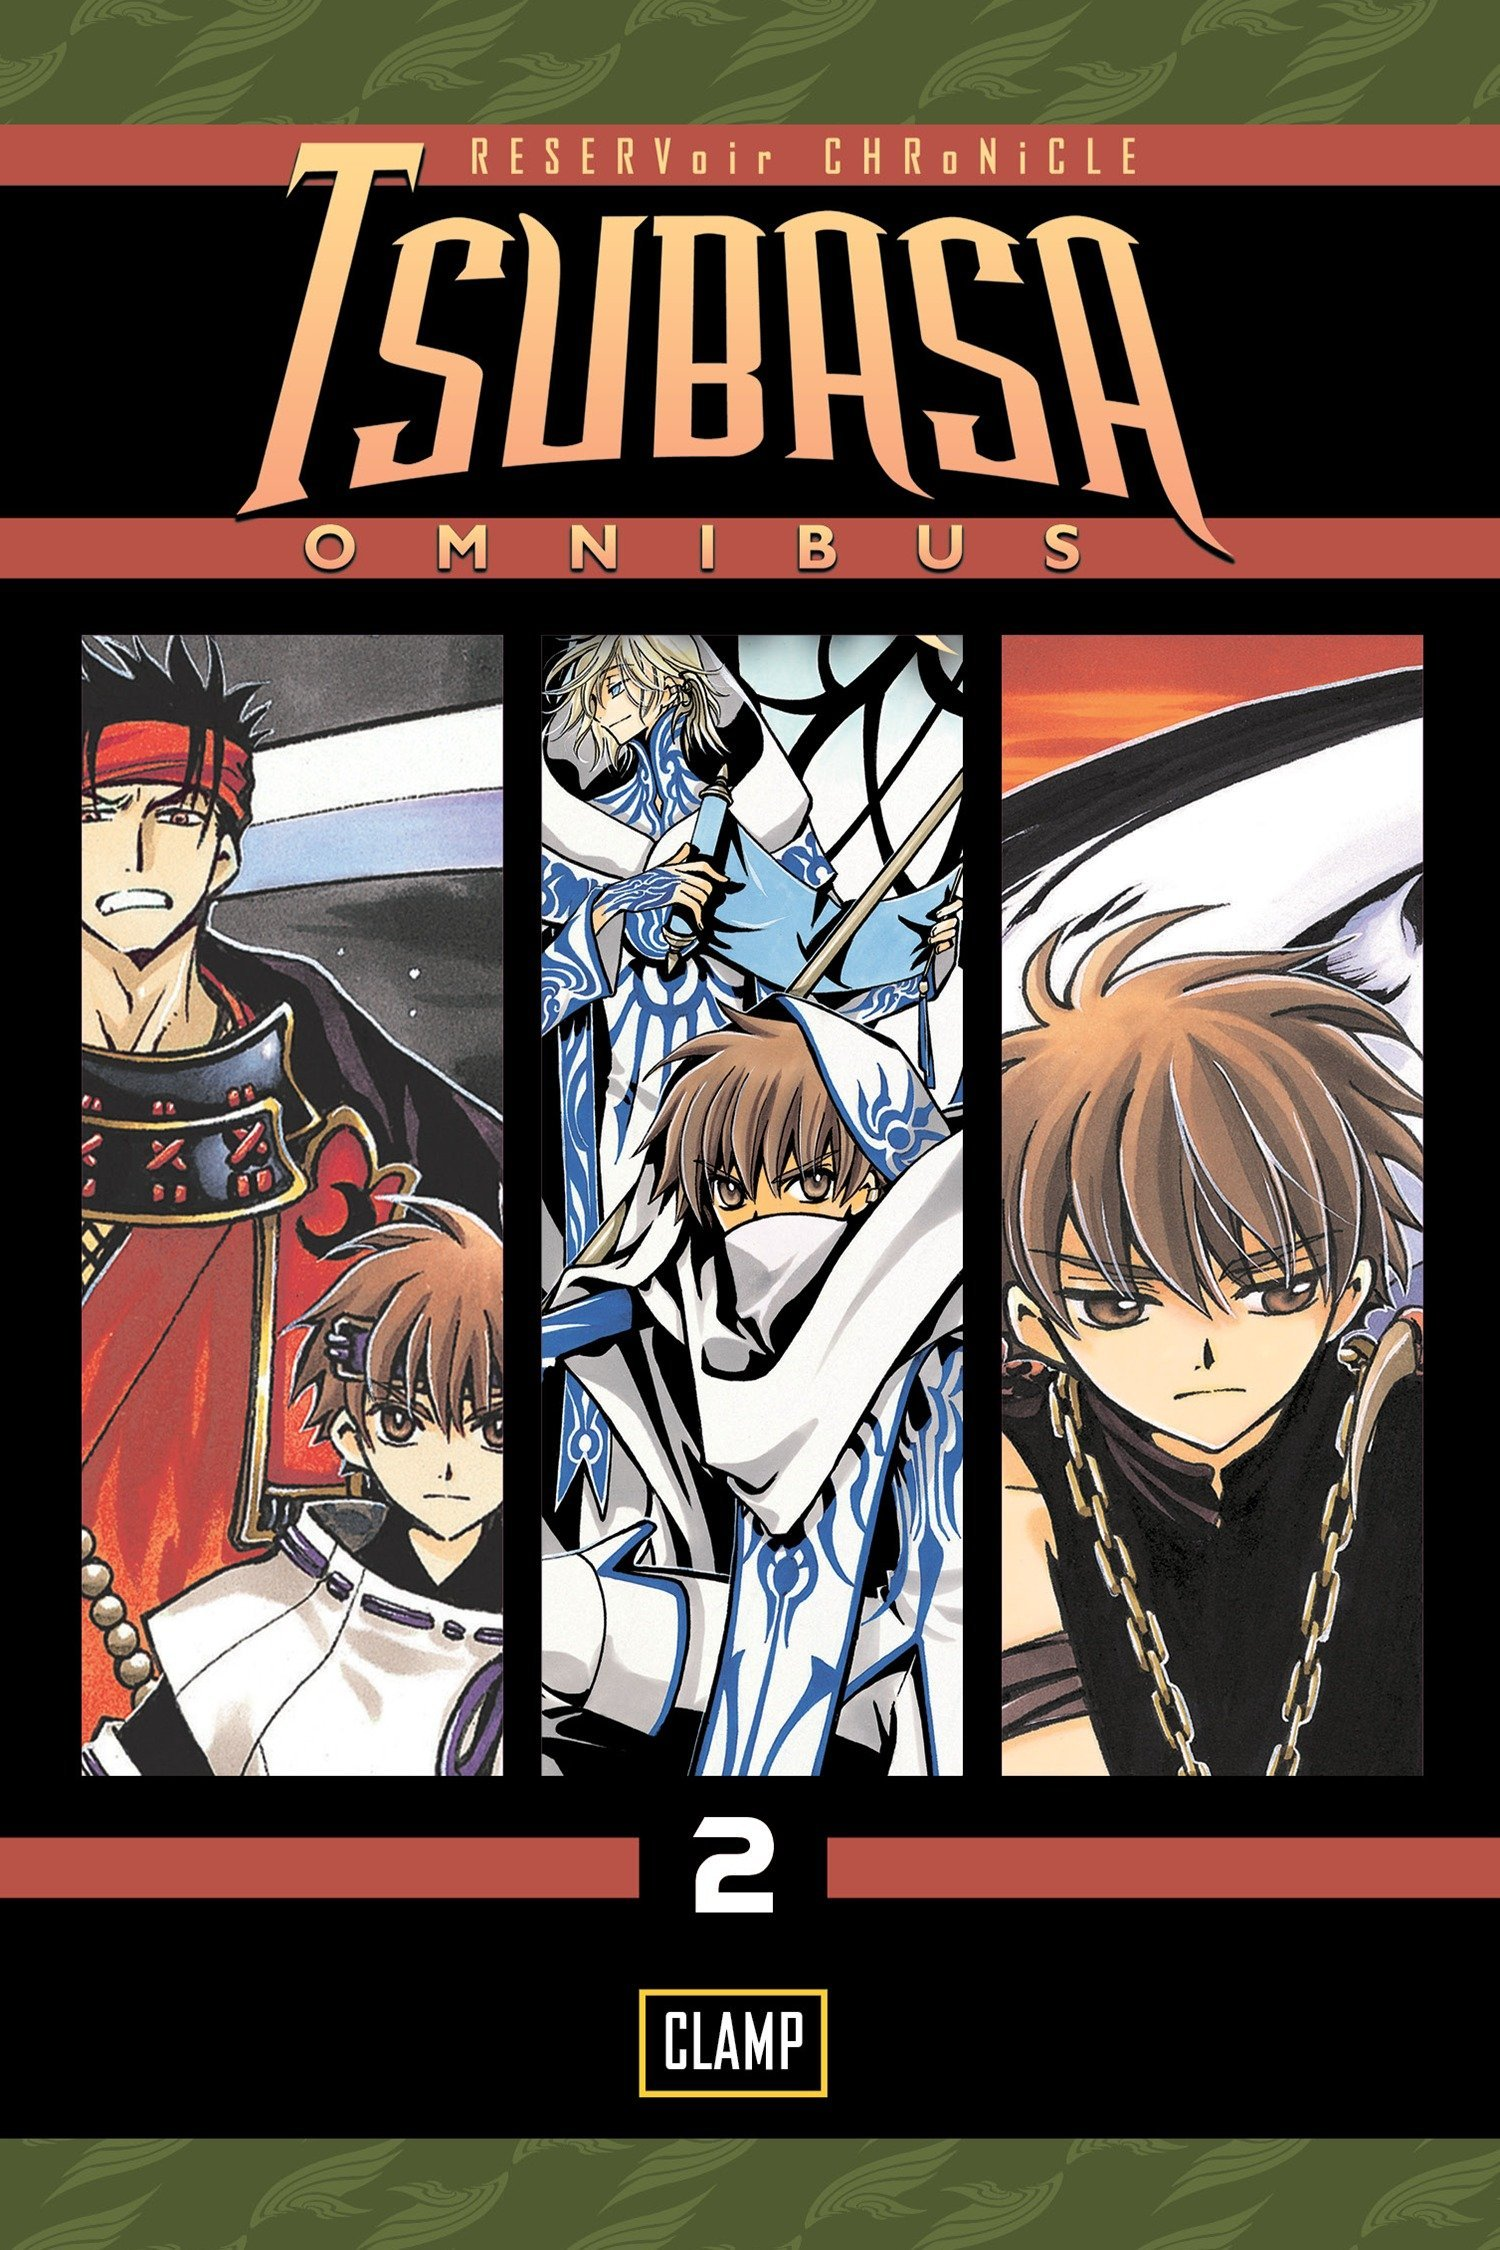 Download Tsubasa Omnibus 2 pdf